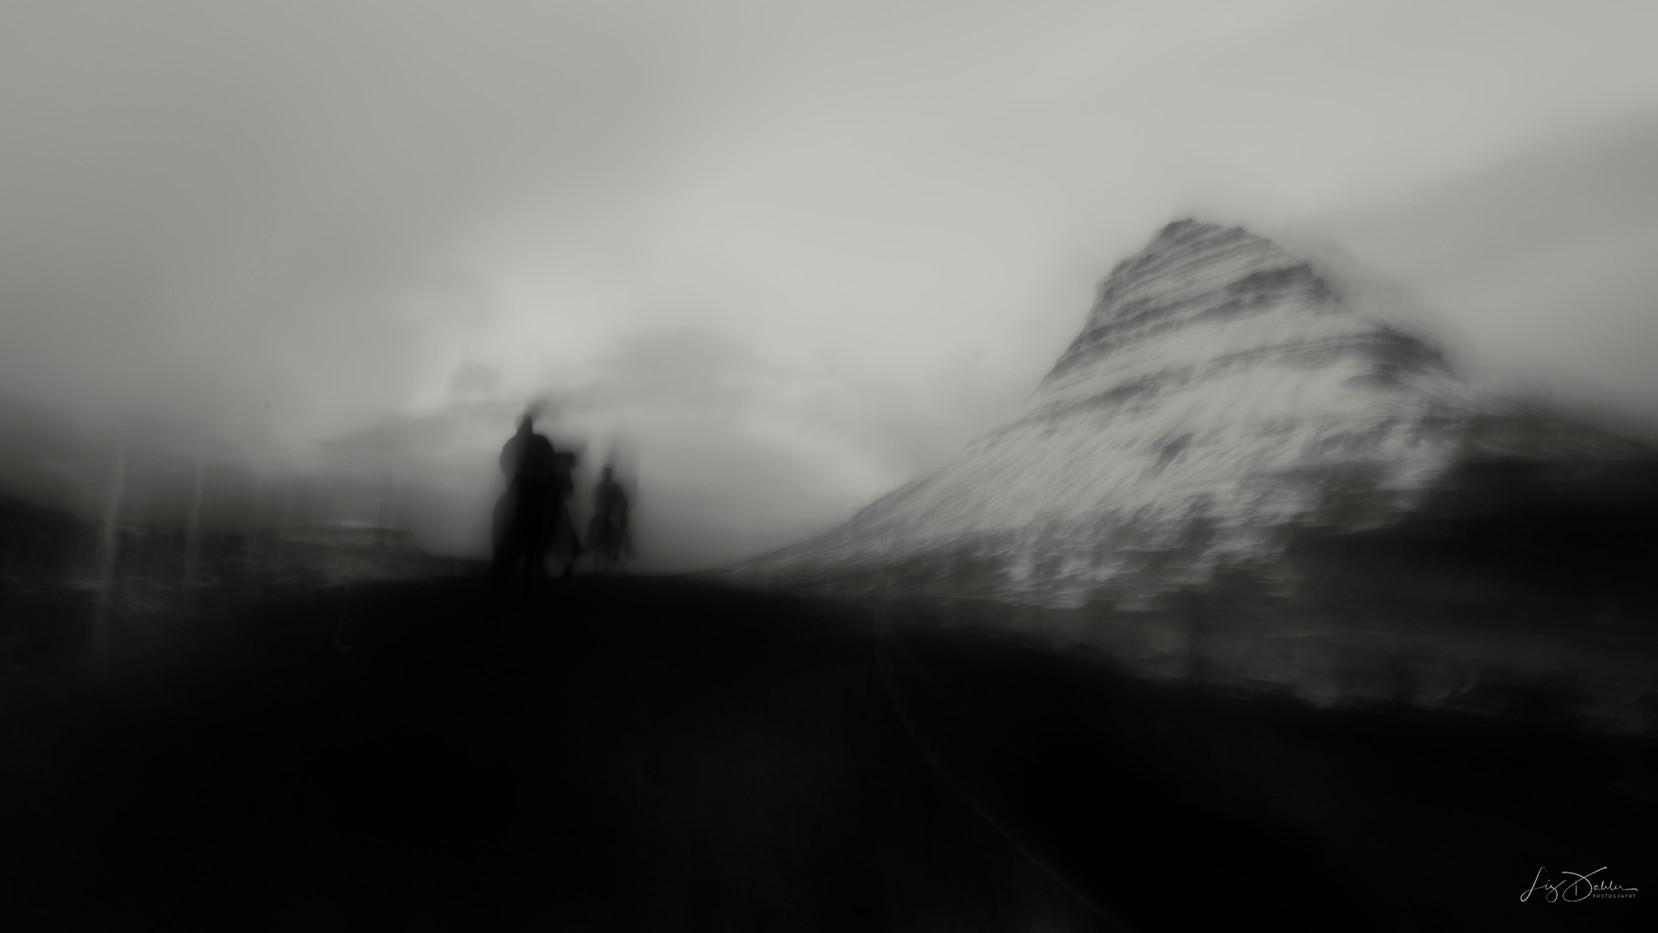 Mystery Riders